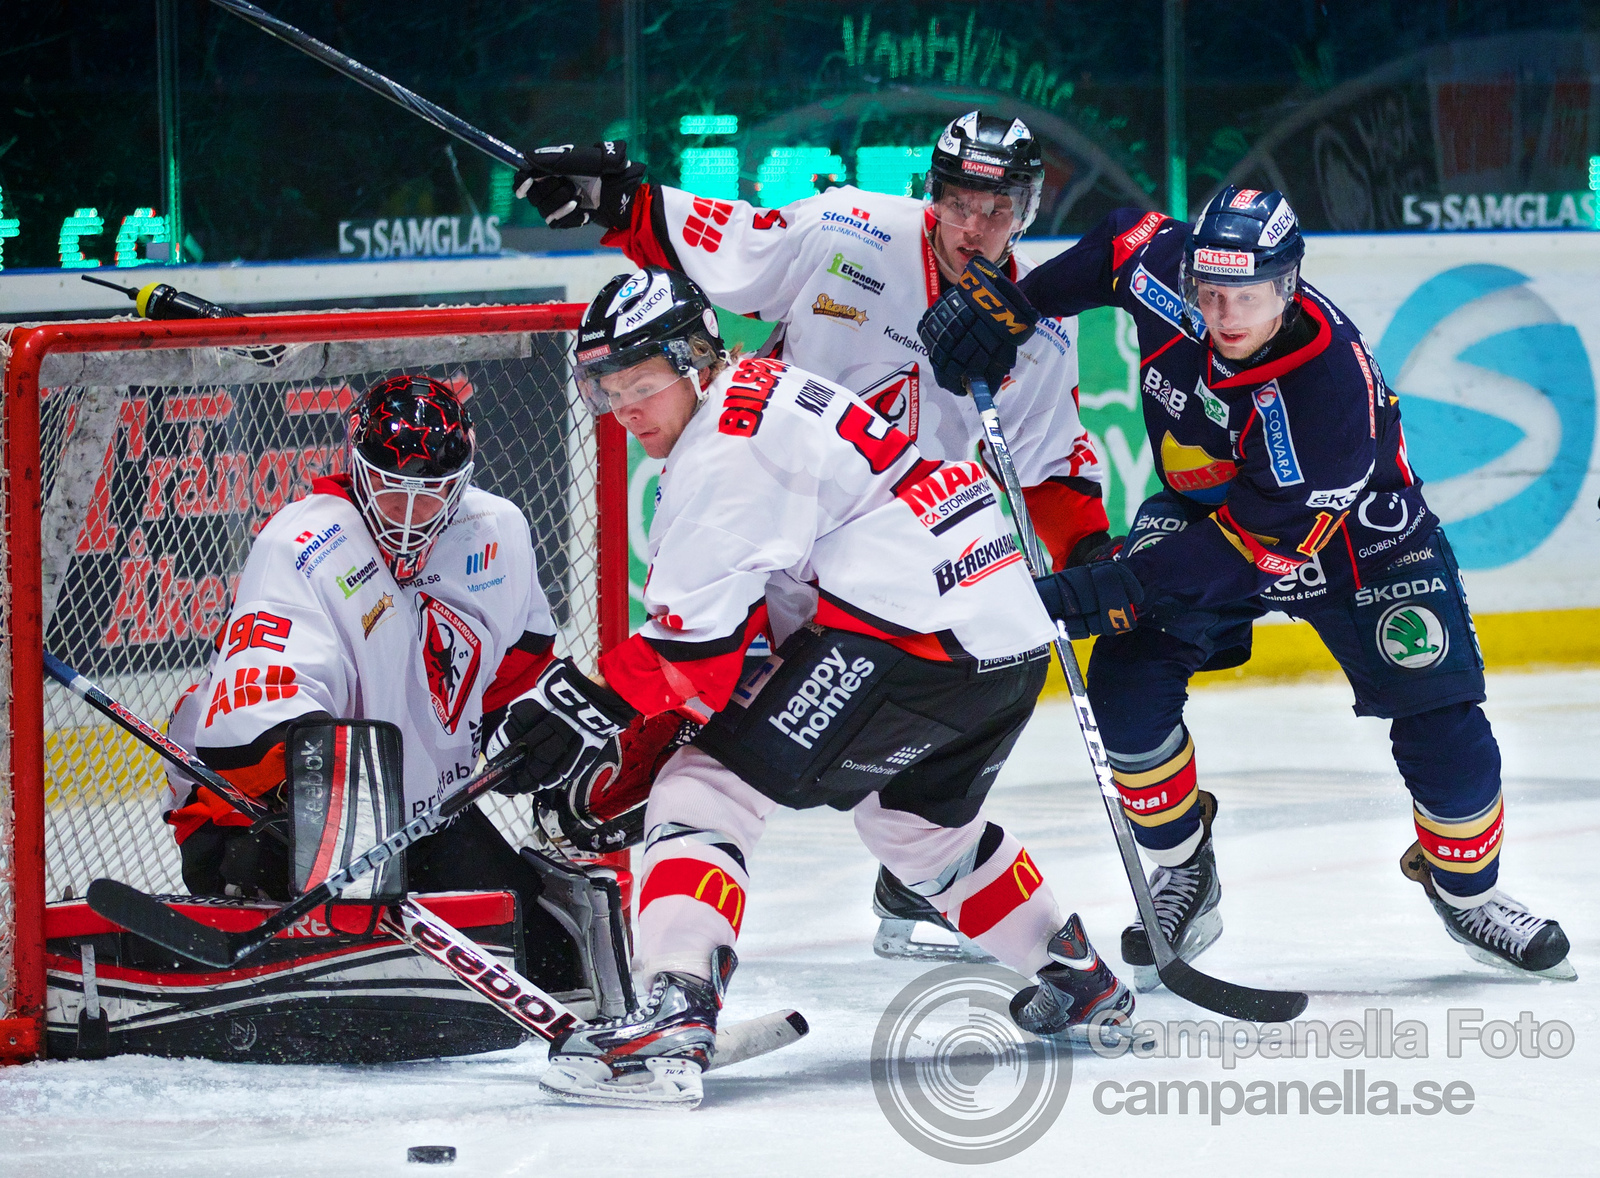 Djurgårdens IF Vs. Karlskrona HK - 2013-02-28 - 9 of 11